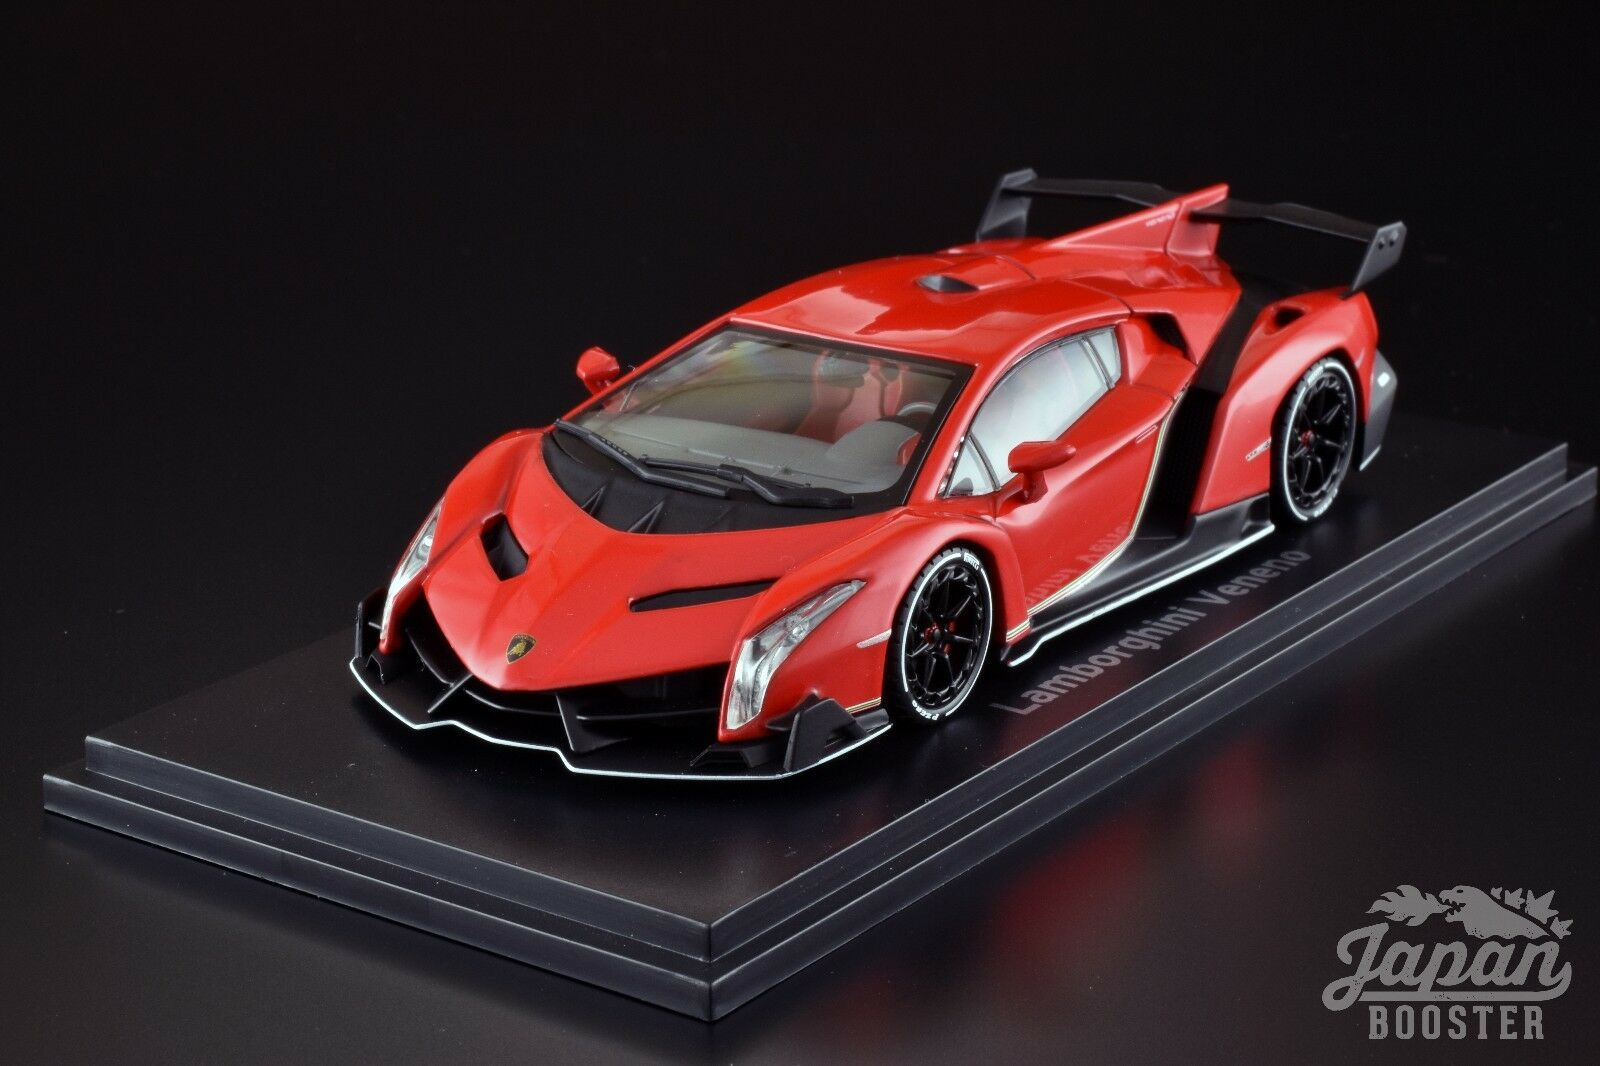 [KYOSHO ORIGINAL 1/43] Lamborghini Veneno rosso Peal/bianca Line rosso KS05571RPW